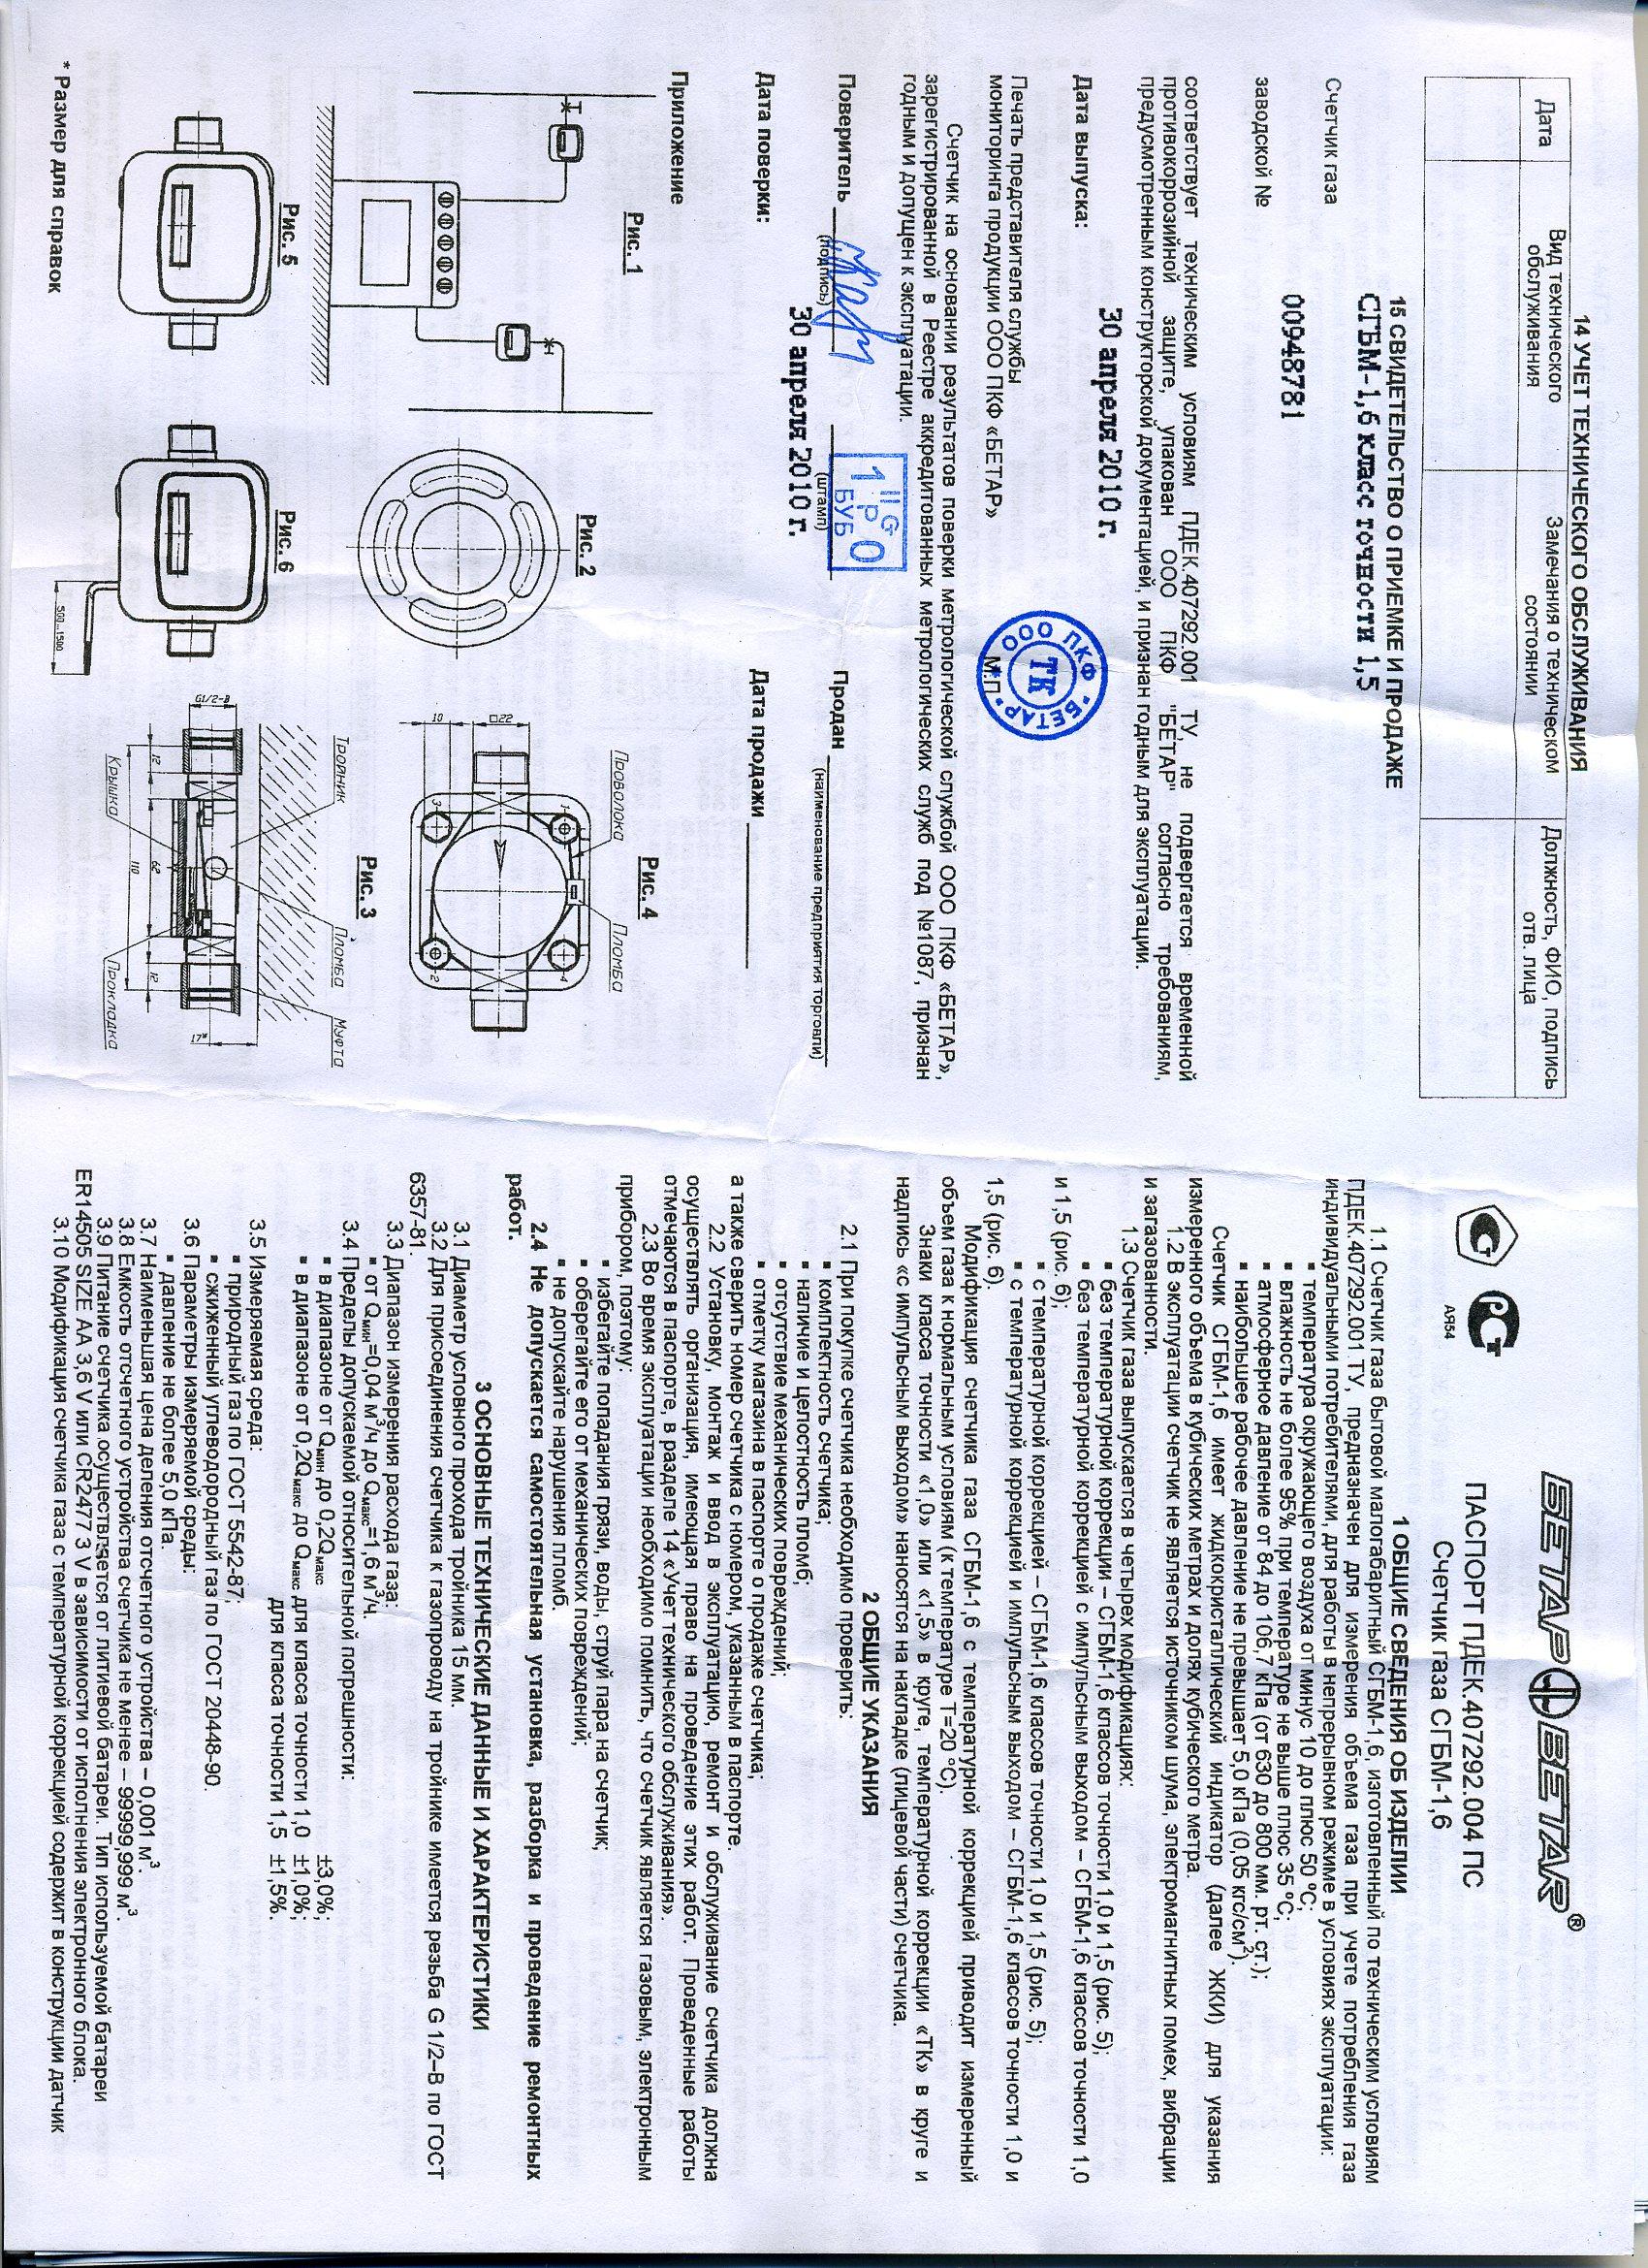 Гдз по русскому языку 6 класс сборник заданий бабайцева